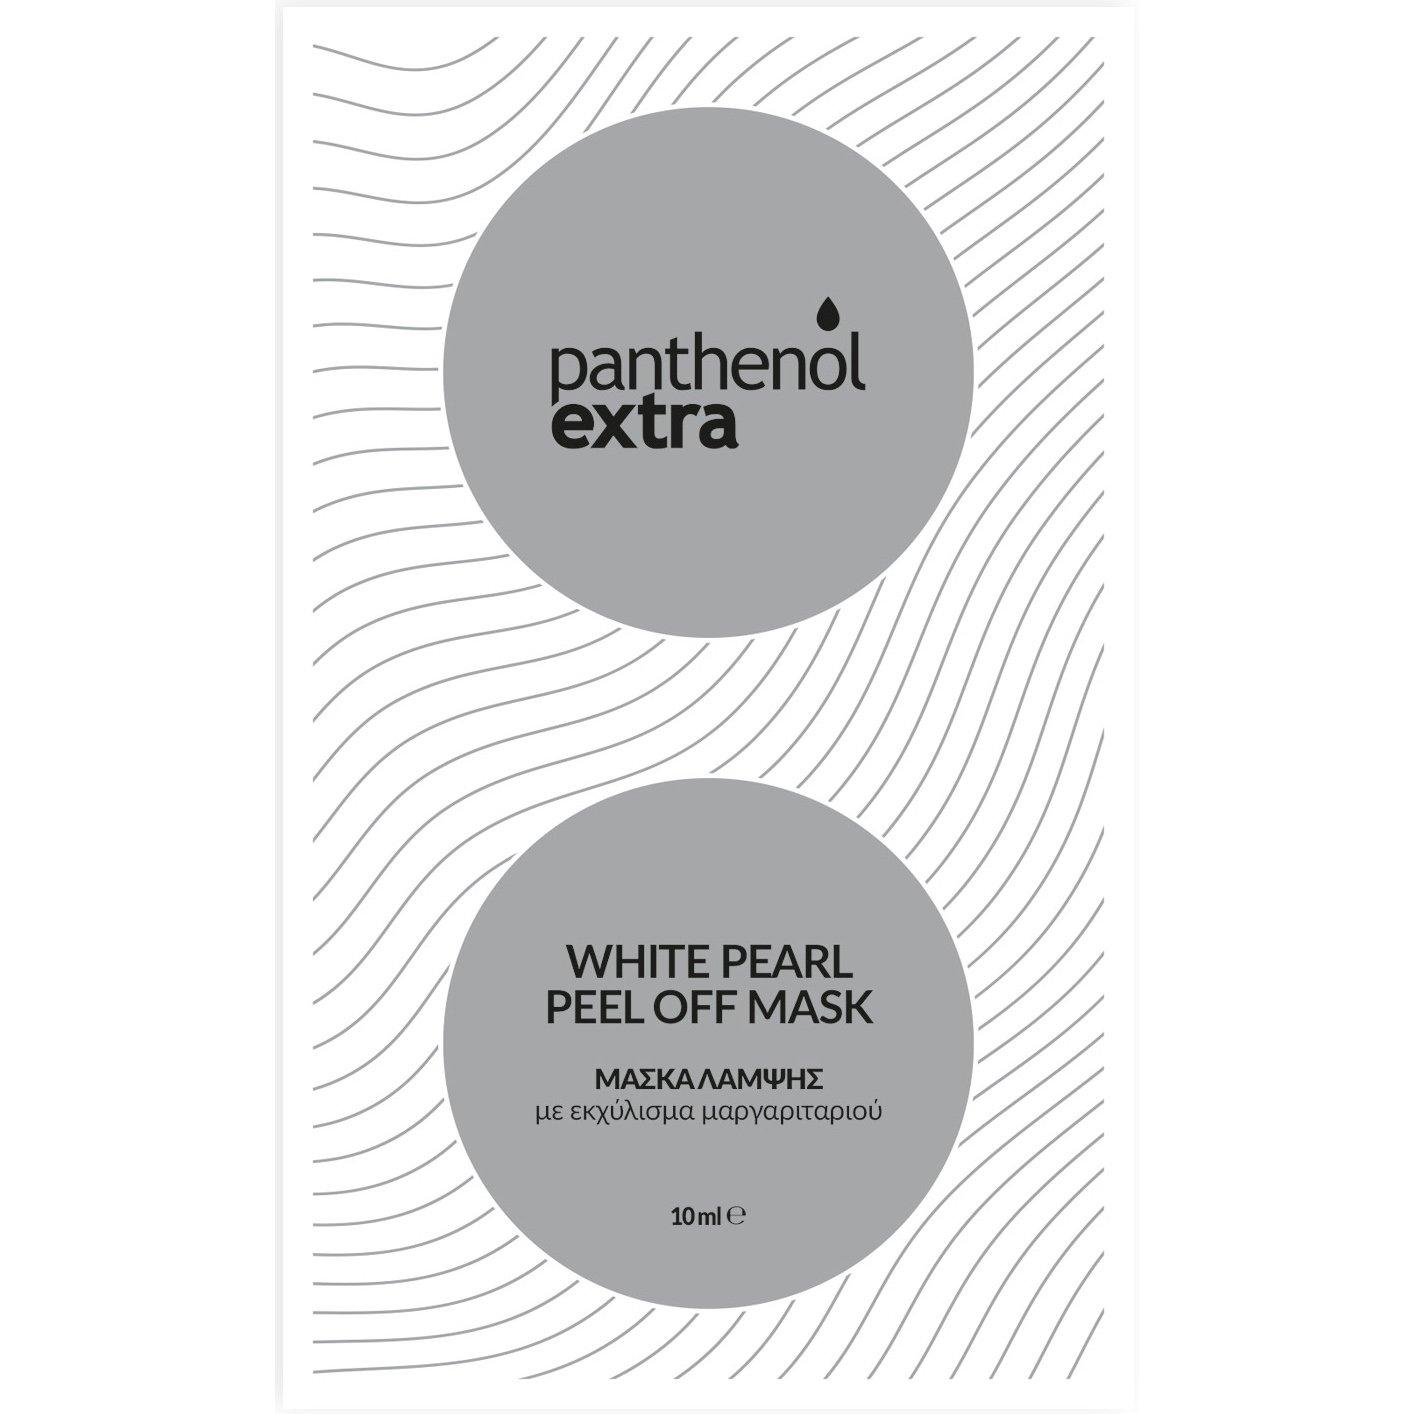 Medisei Panthenol Extra White Pearl Peel Off Mask Μάσκα Λάμψης για το Πρόσωπο με Εκχύλισμα Ελαίου Μαργαριταριού 10ml